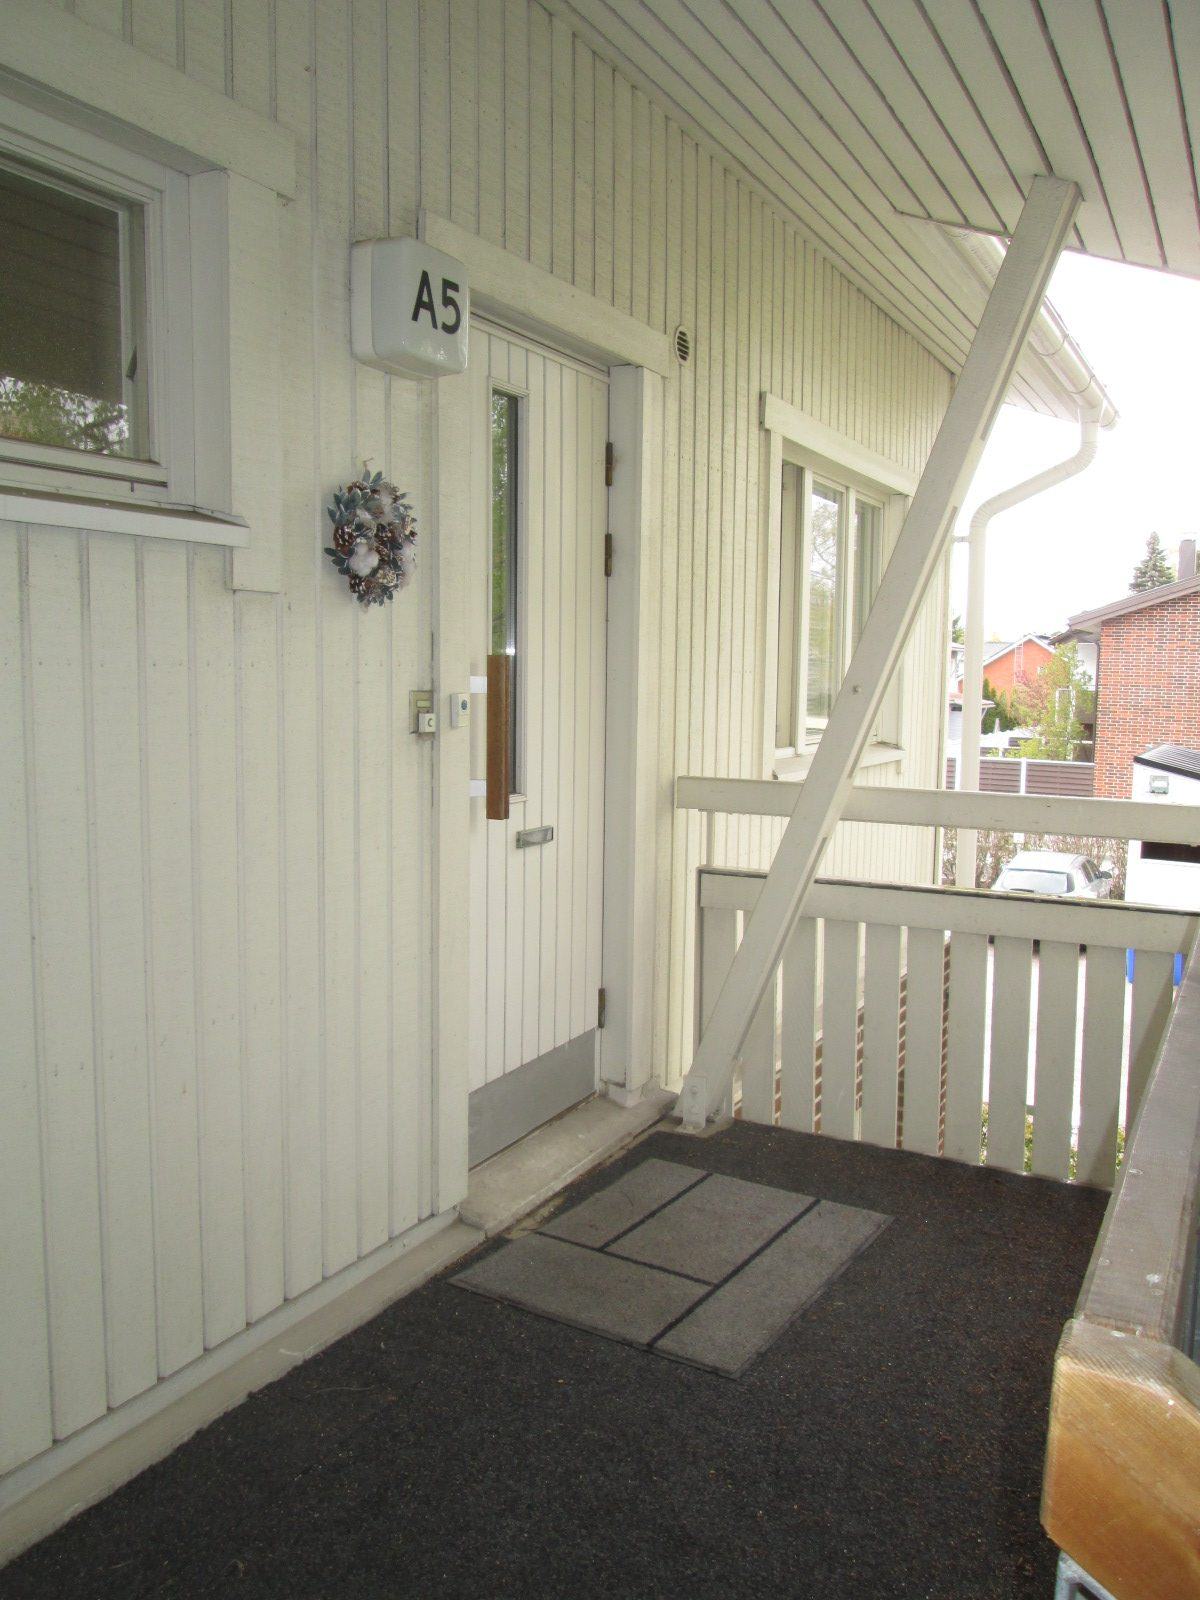 58,5 m² Lauhatie 1 A, Viertola, Vantaa 2h, keittiö, sauna, kph,wc, vh, parveke. Vh 187 953 €